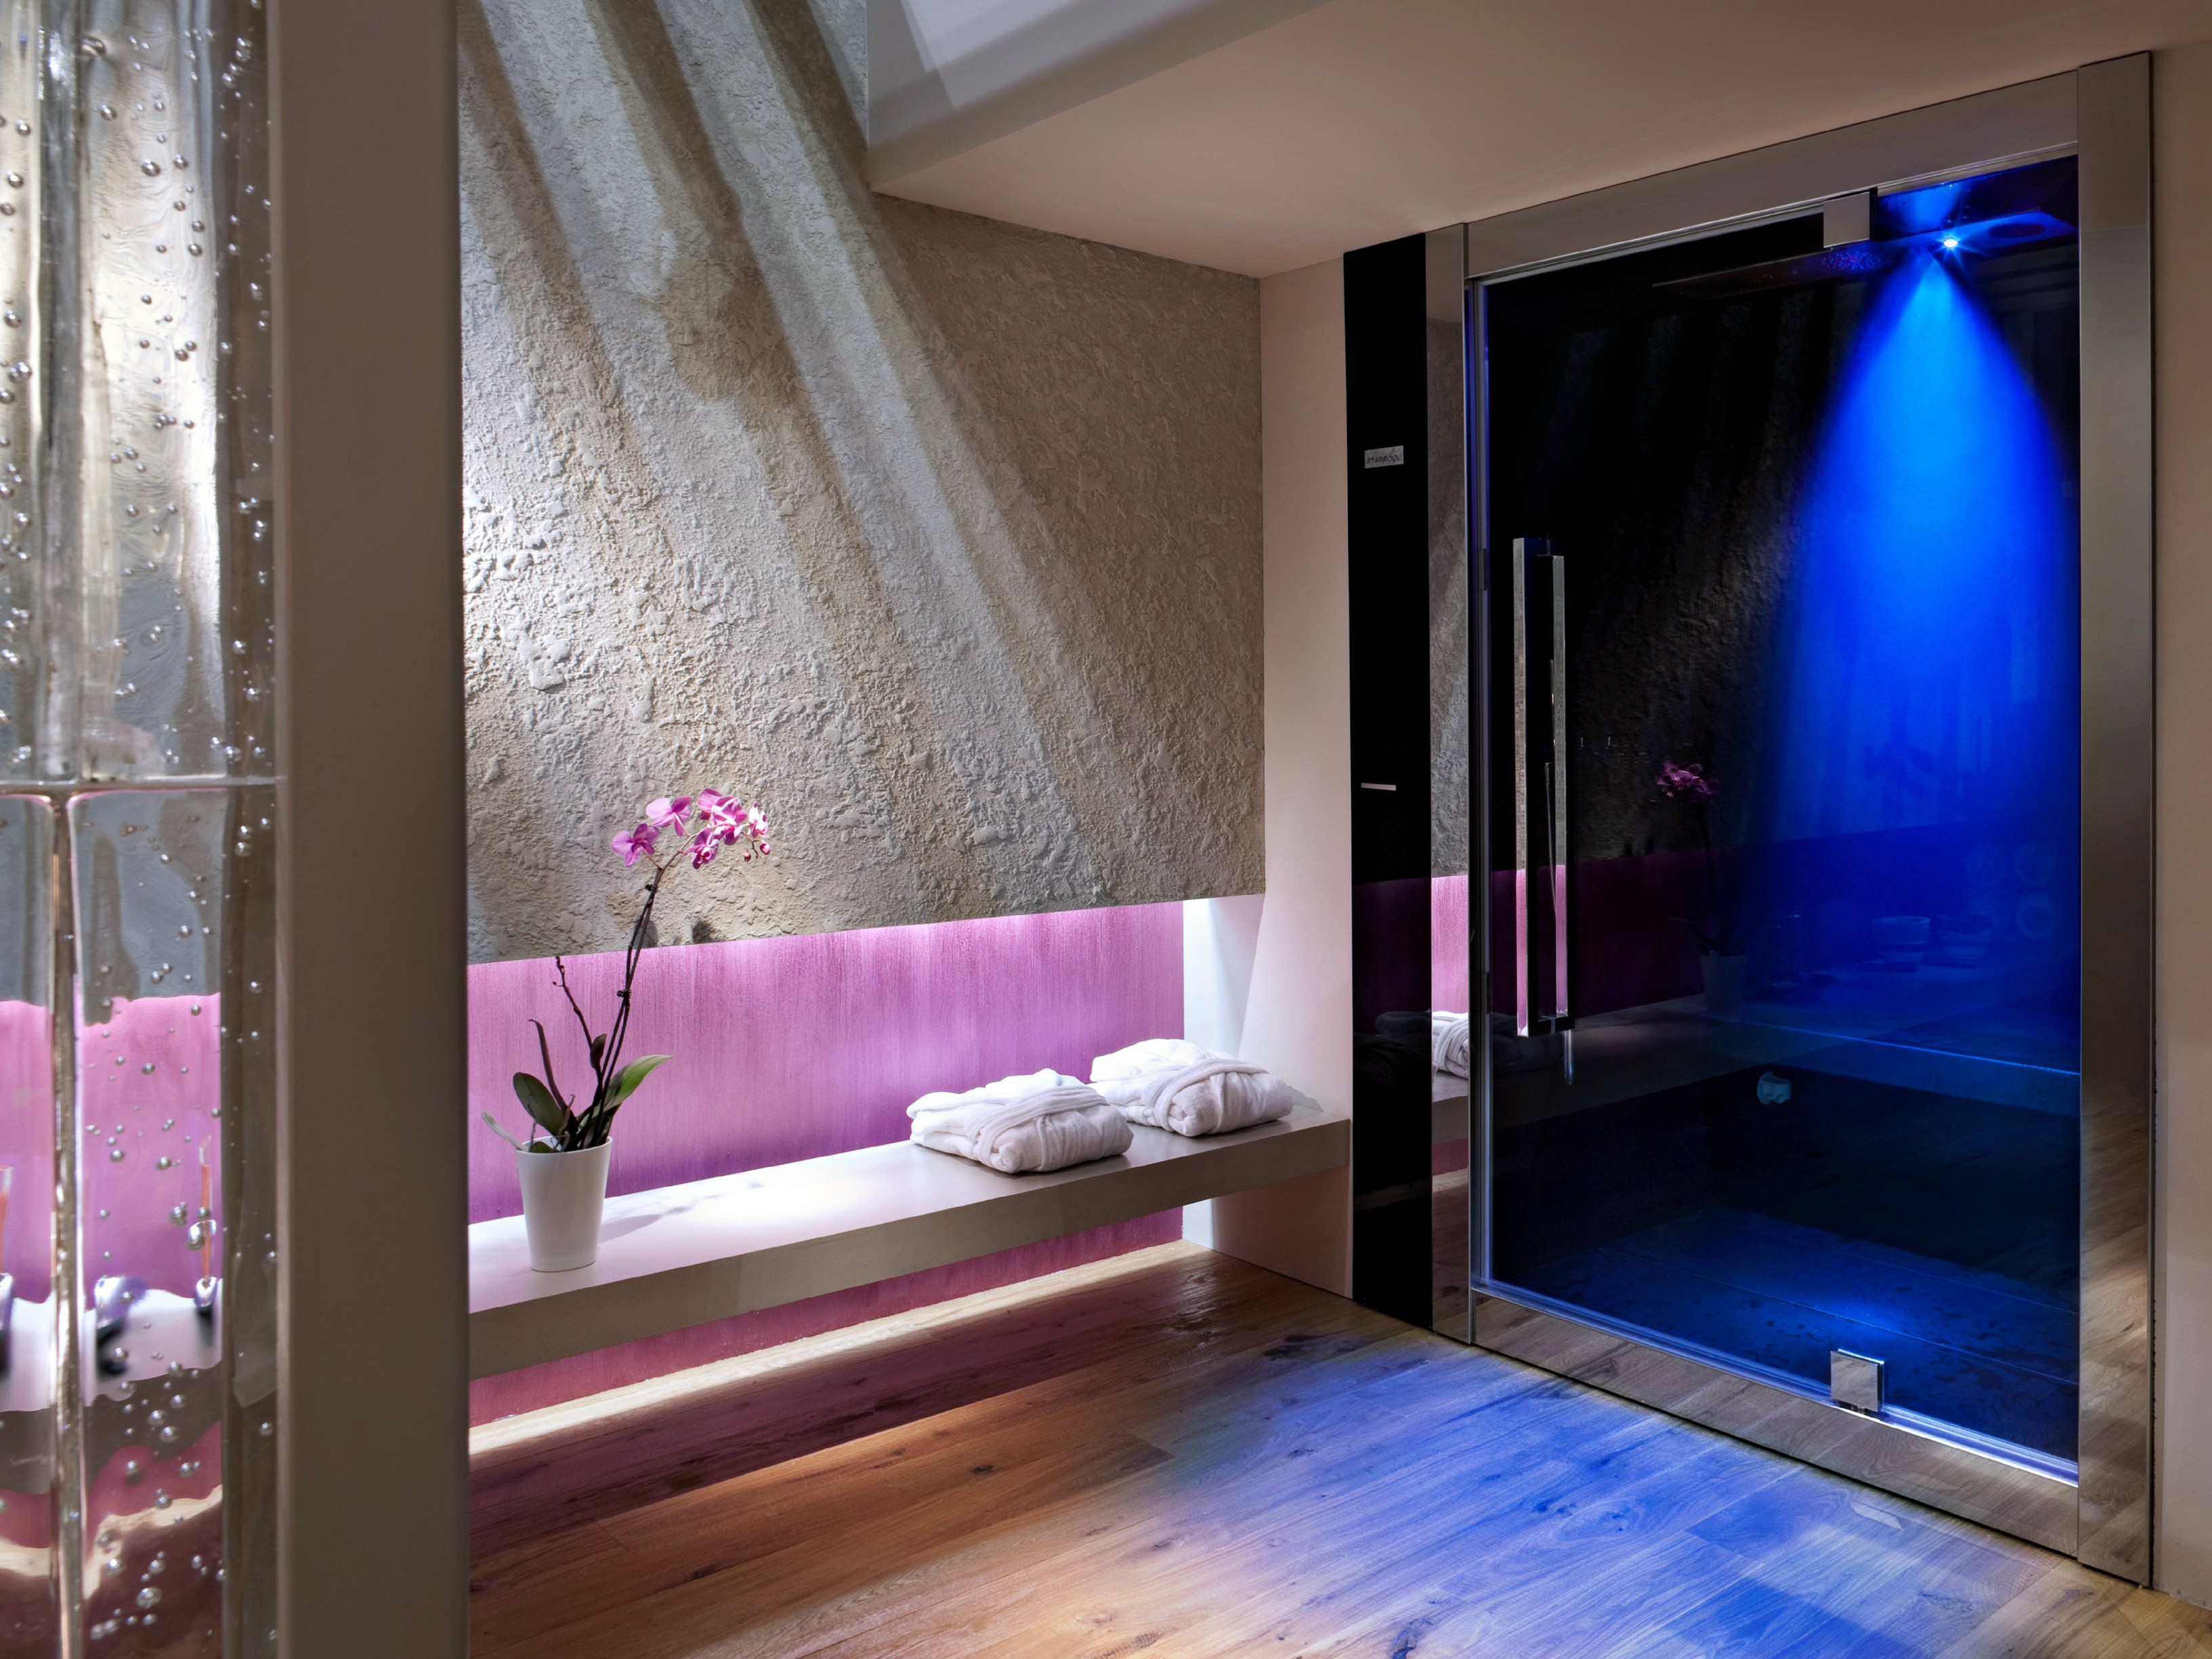 Bagno turco per cromoterapia sweet spa by starpool design - Cromoterapia vasca bagno ...